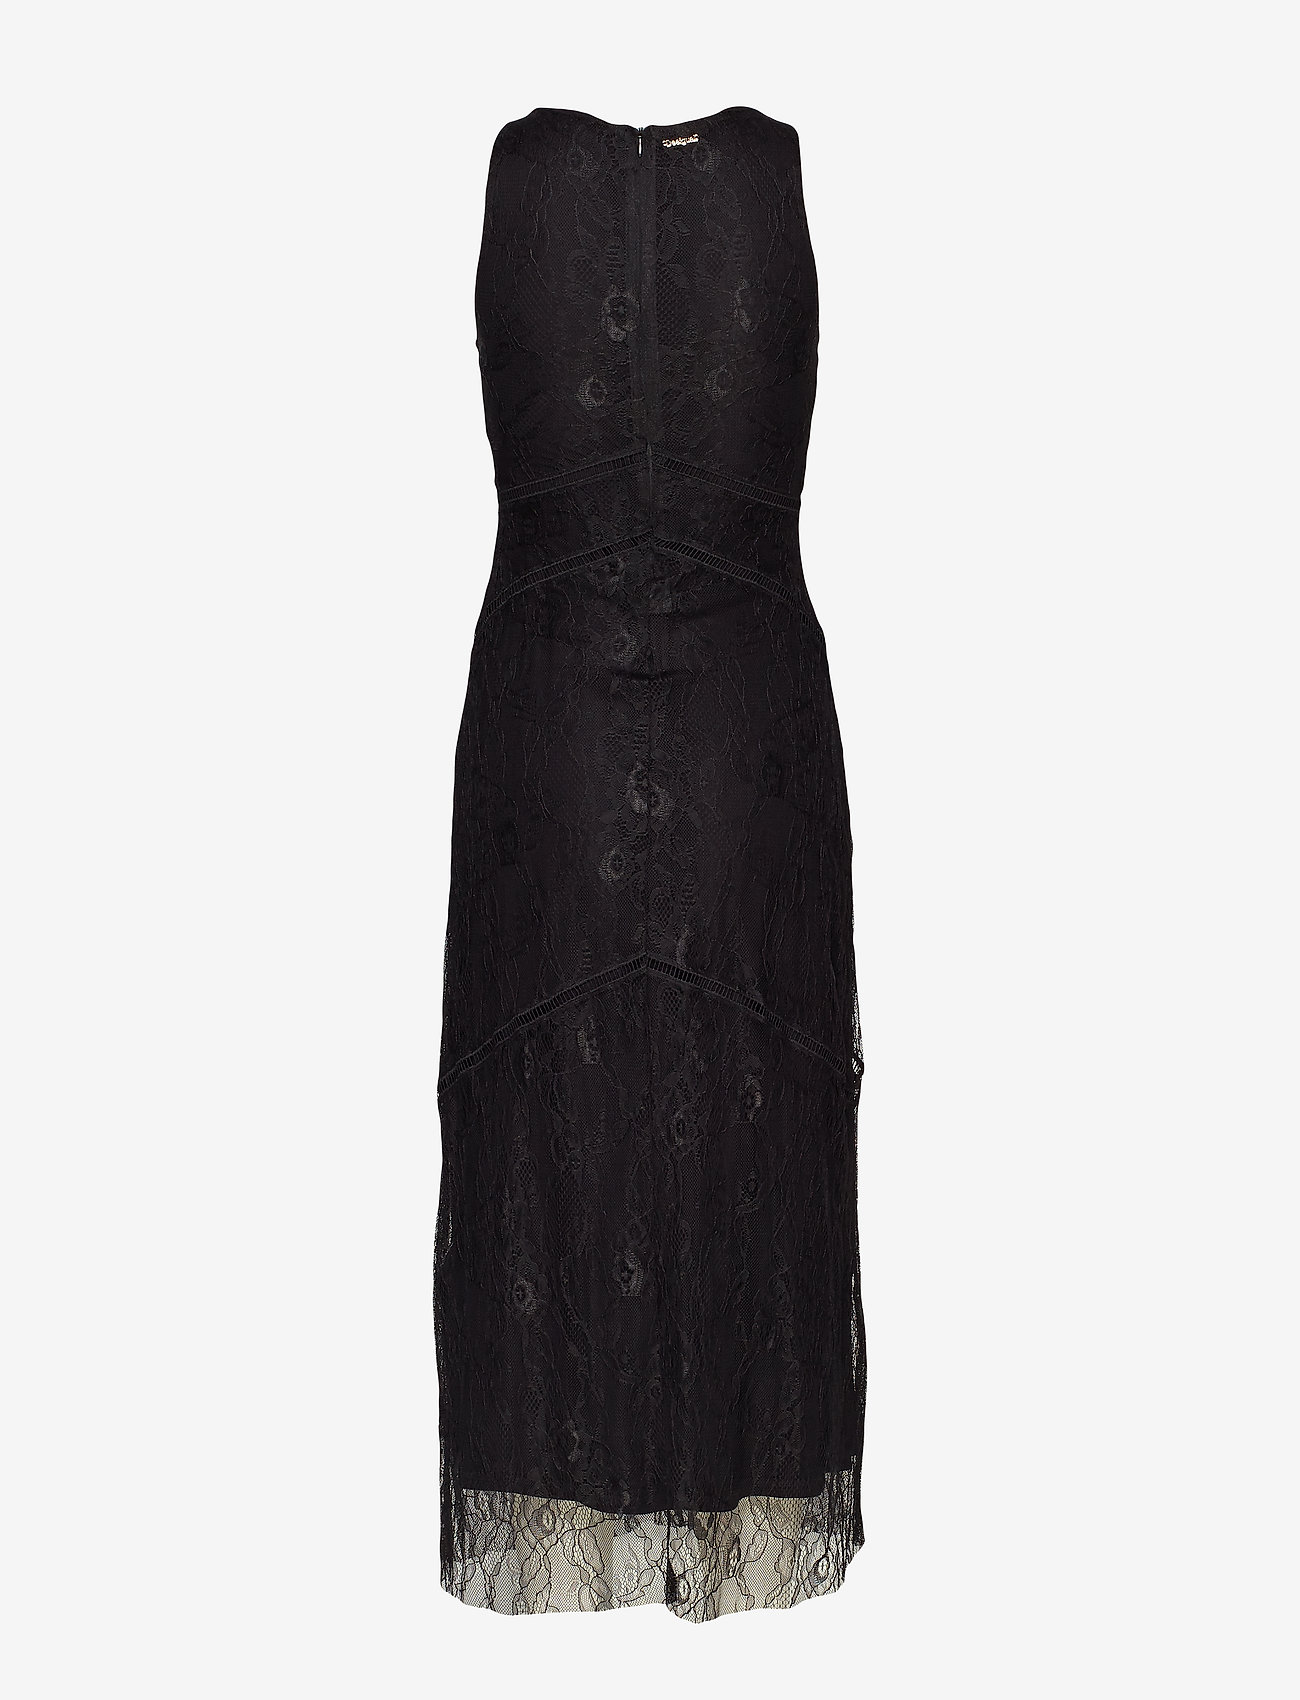 Desigual - VEST LAMAR - midi jurken - negro - 1